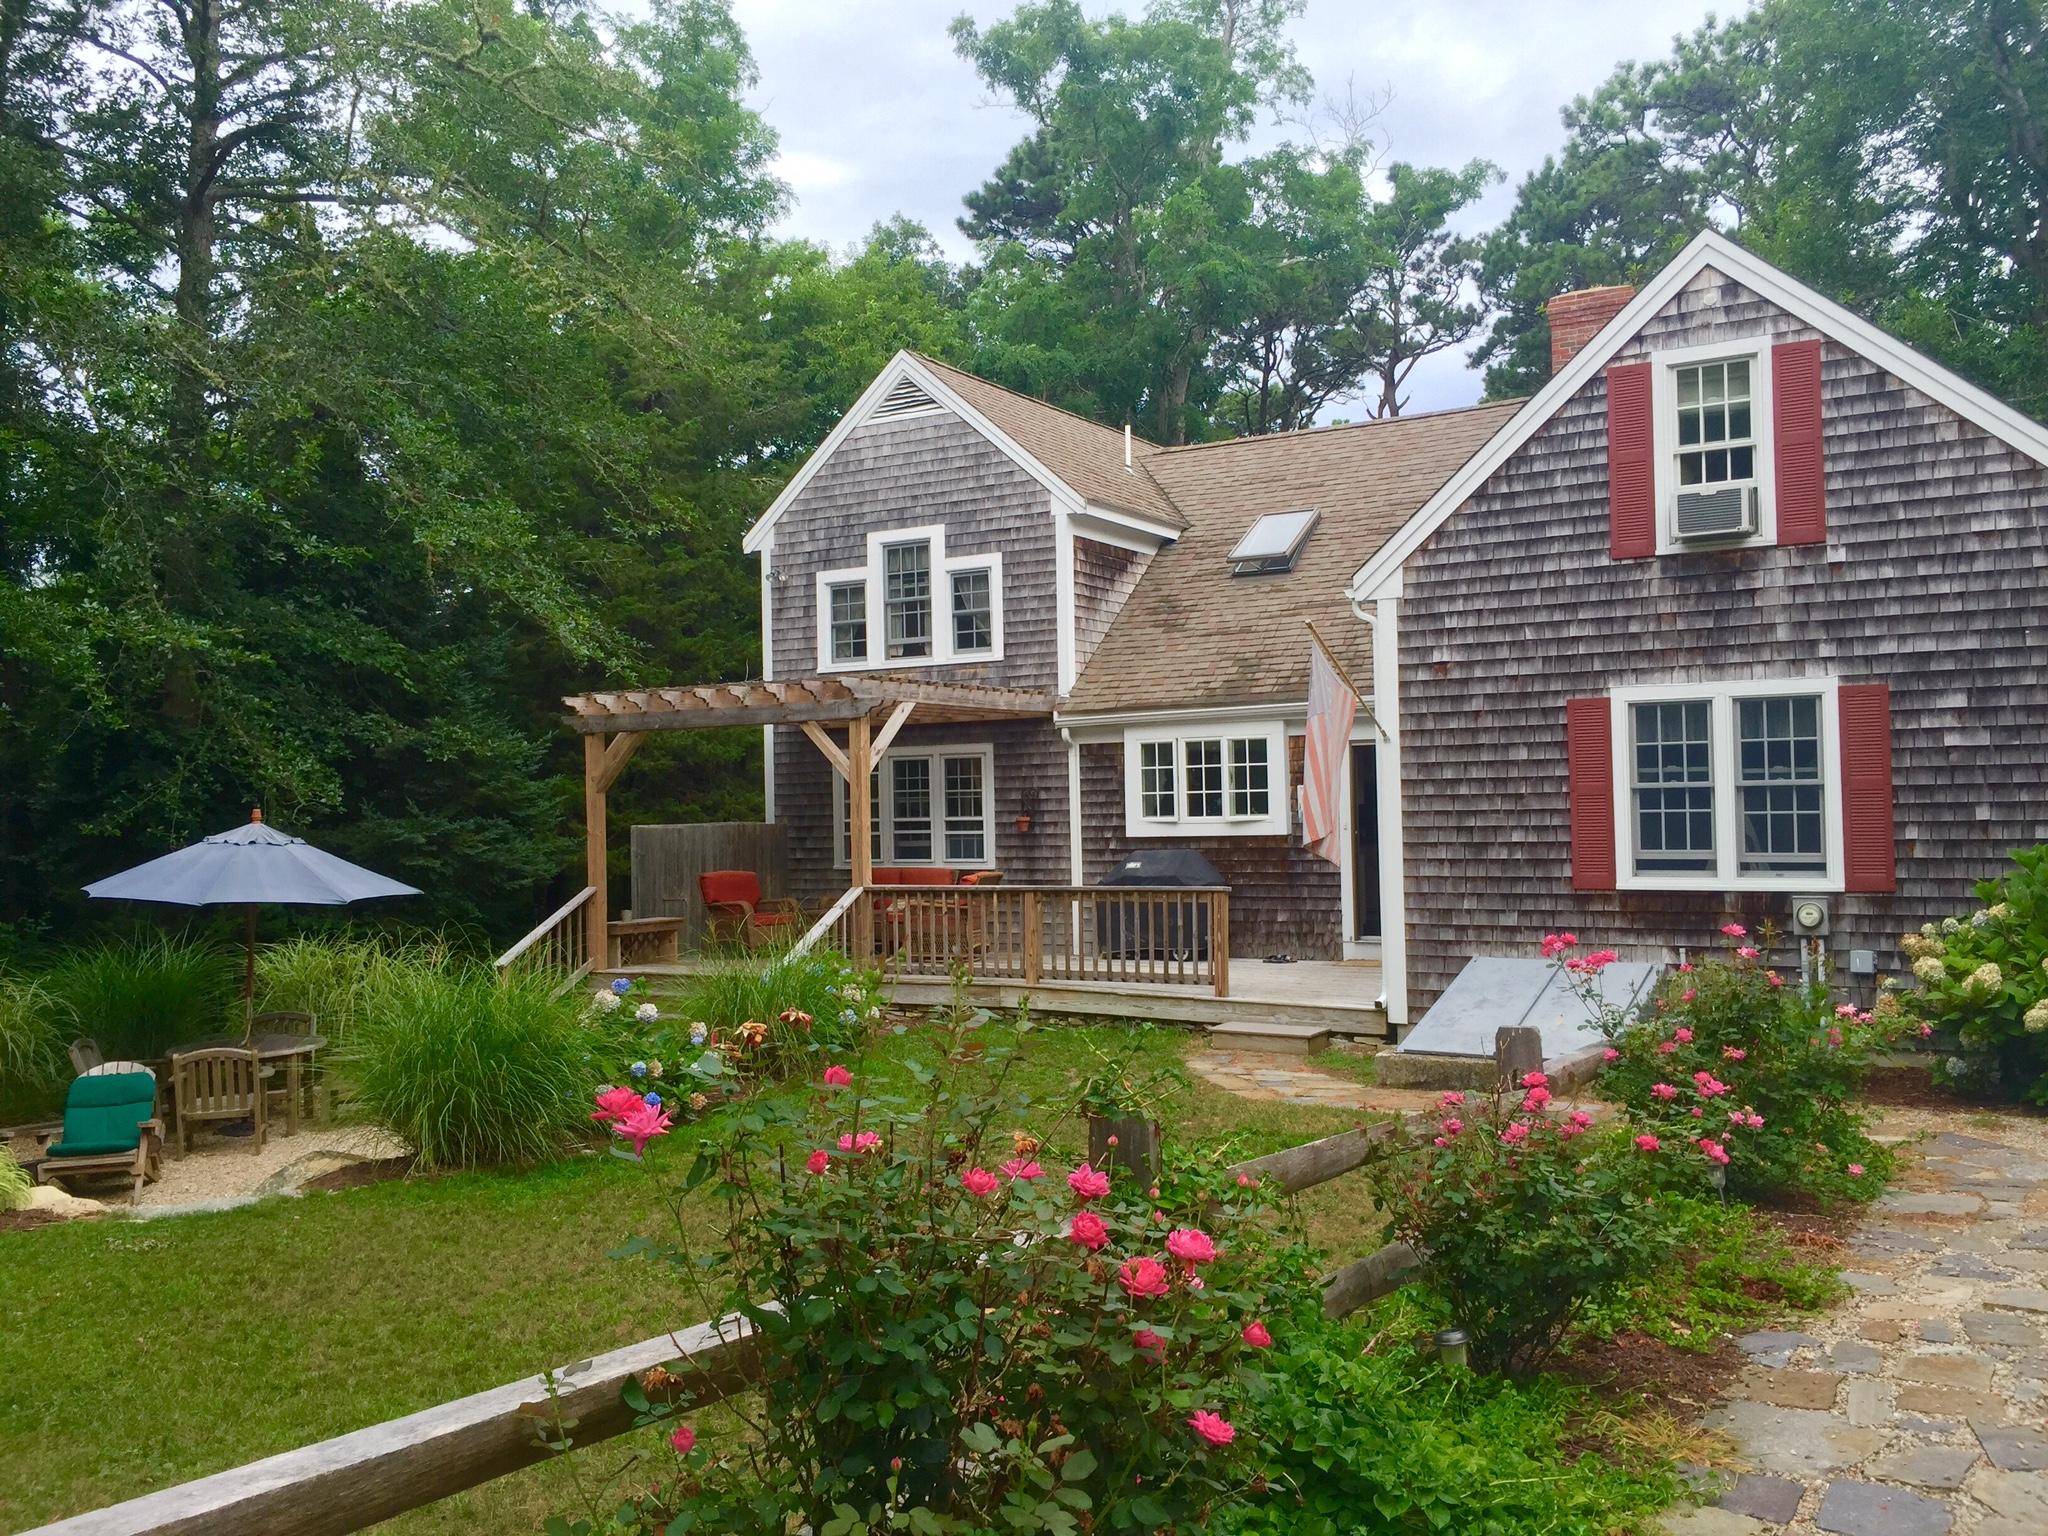 Moradia para Venda às Picturesque Cape 334 Stony Brook Road Brewster, Massachusetts, 02631 Estados Unidos